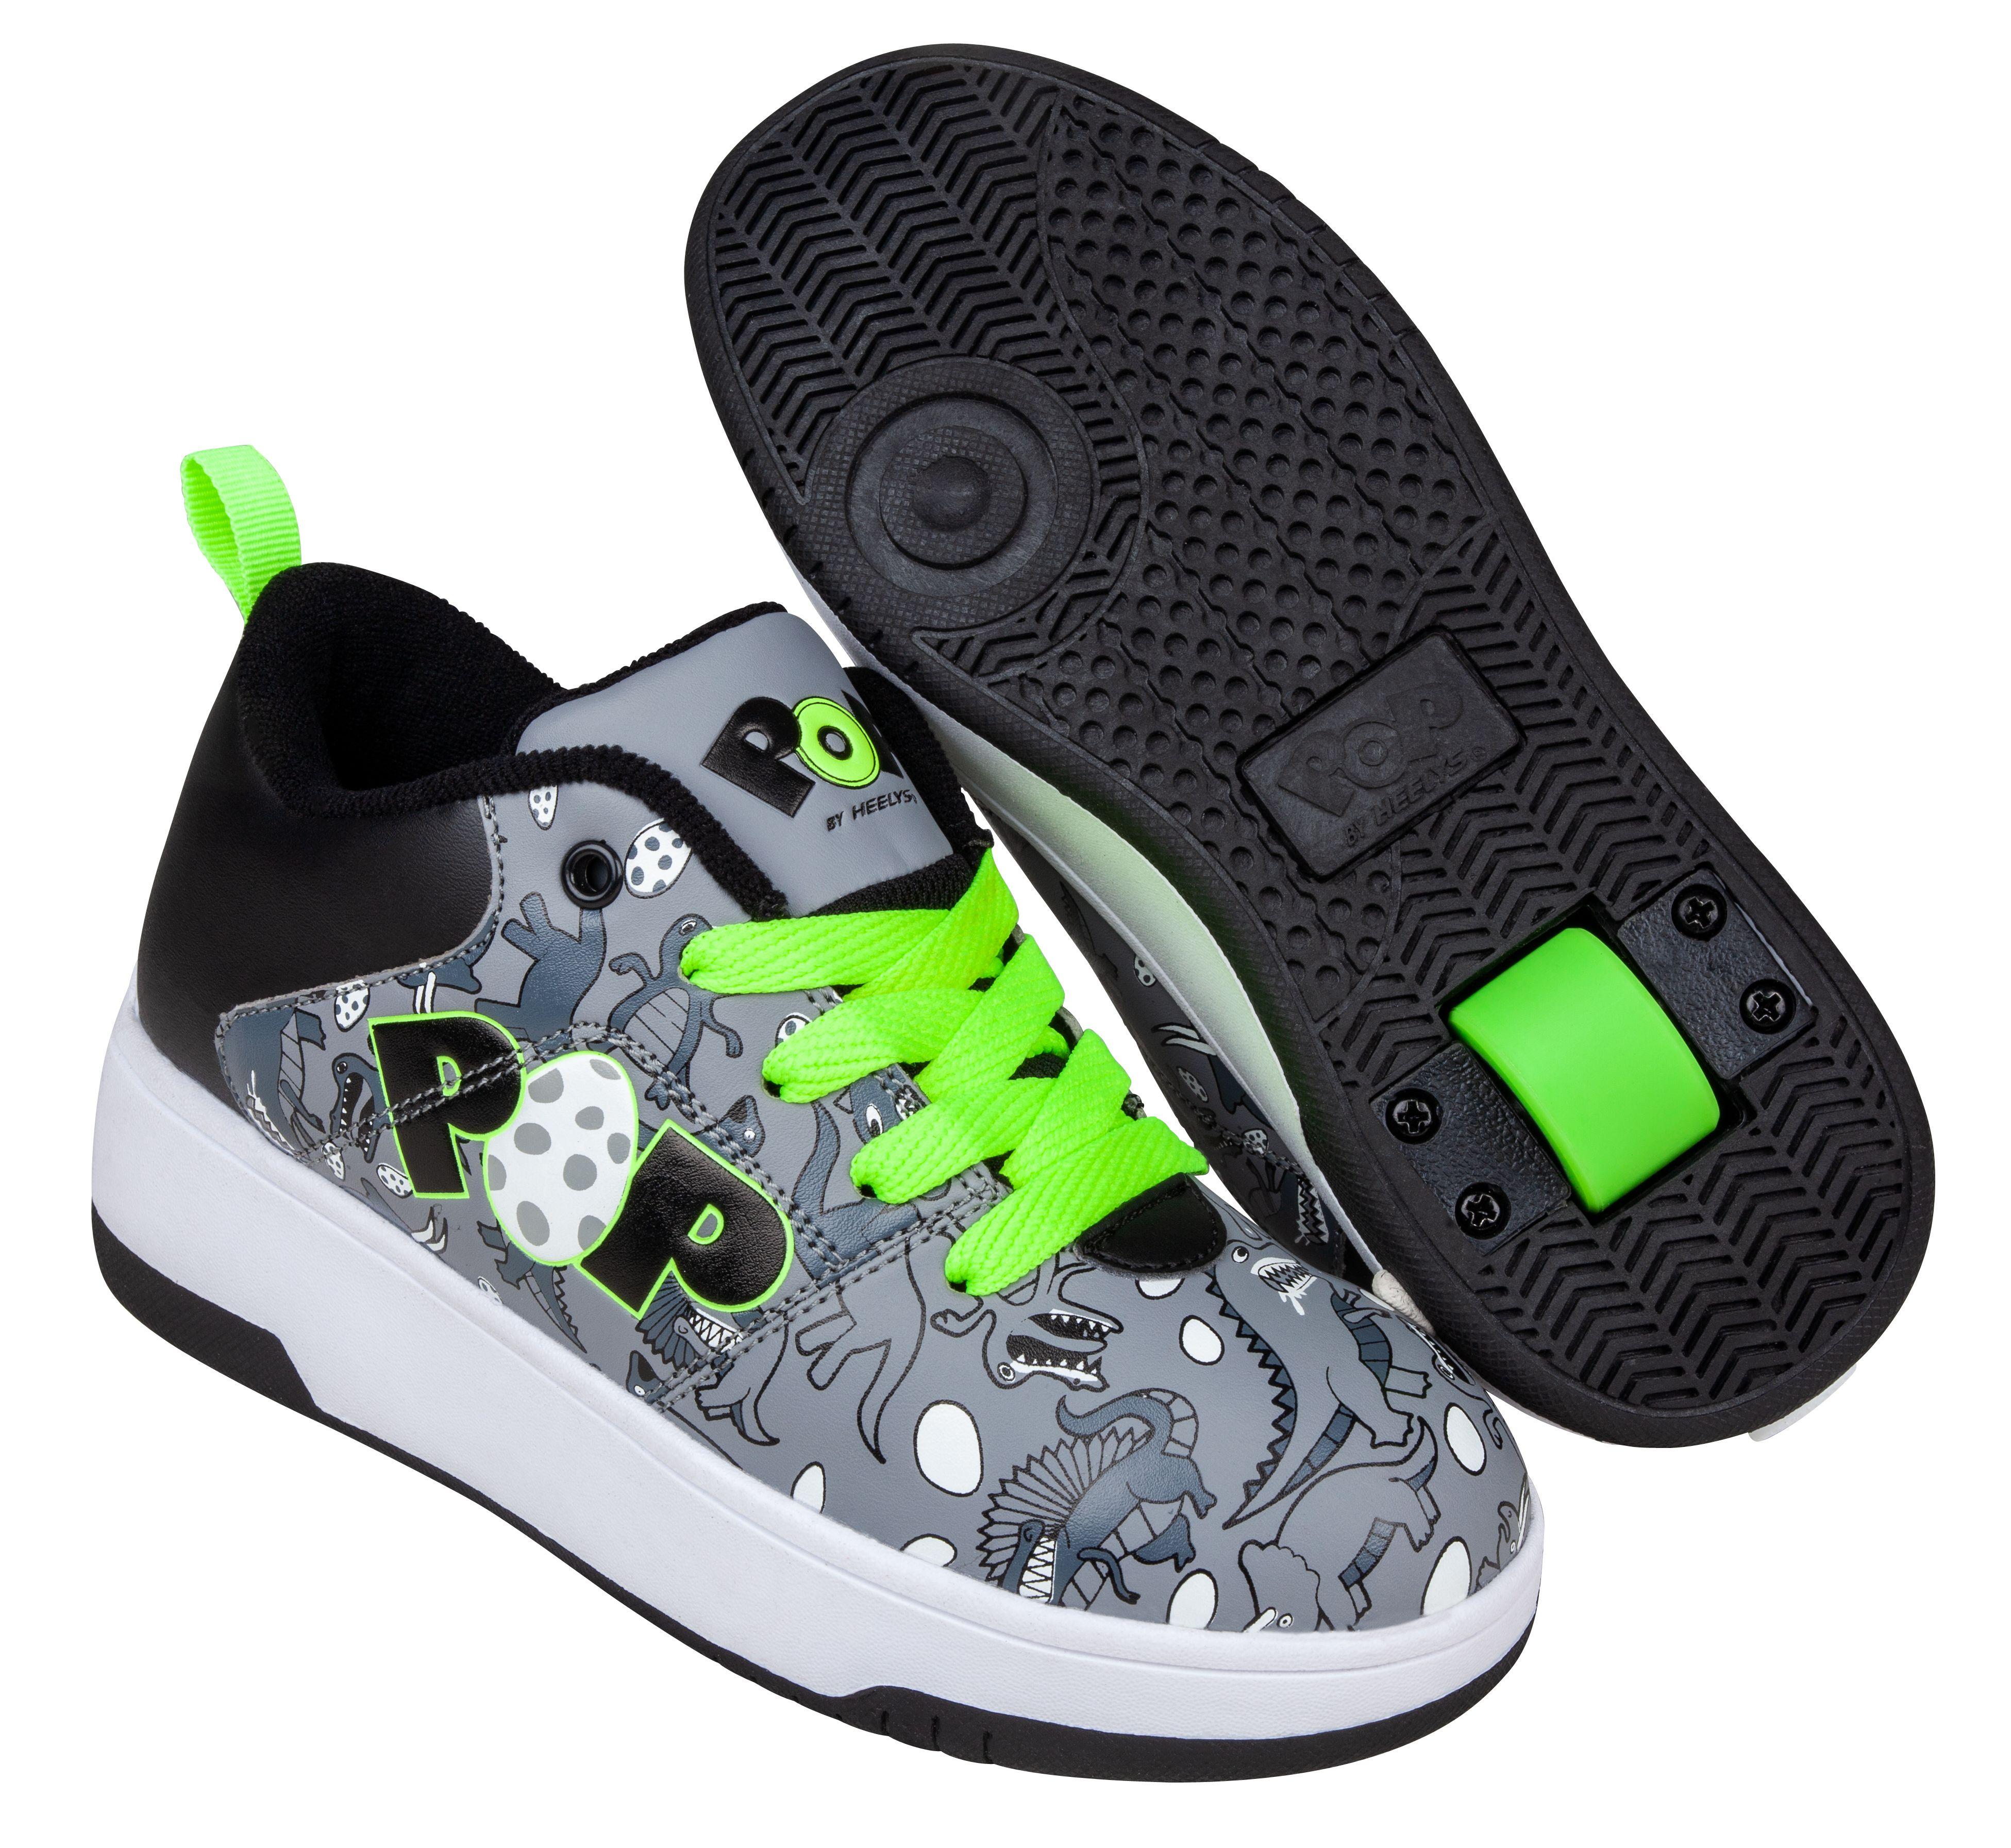 Heelys - POP Shoes - Charcoal (size 34) (POP-B1W-0083)